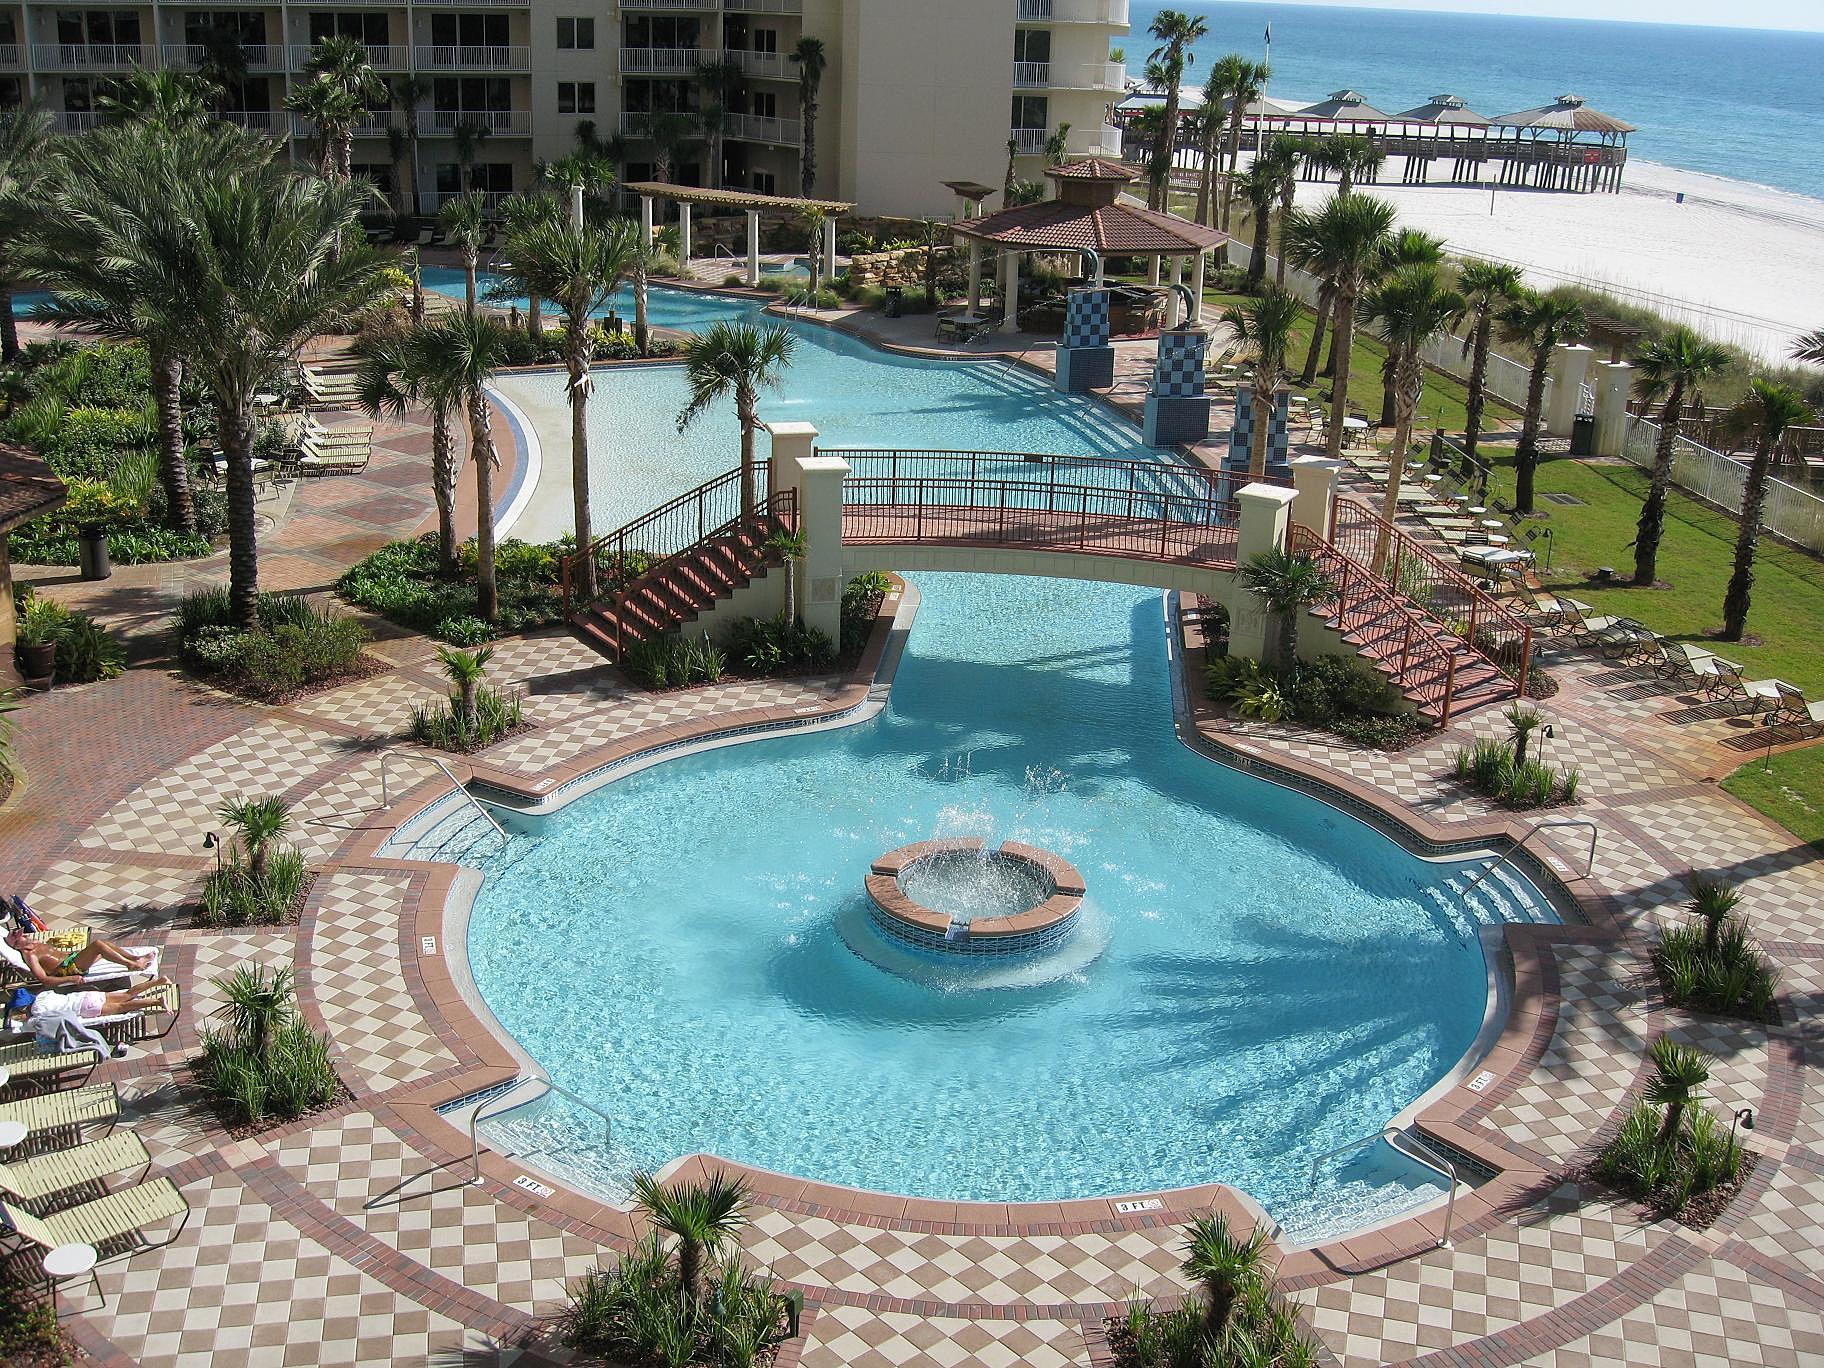 Outdoor and indoor pools for Biggest outdoor pool